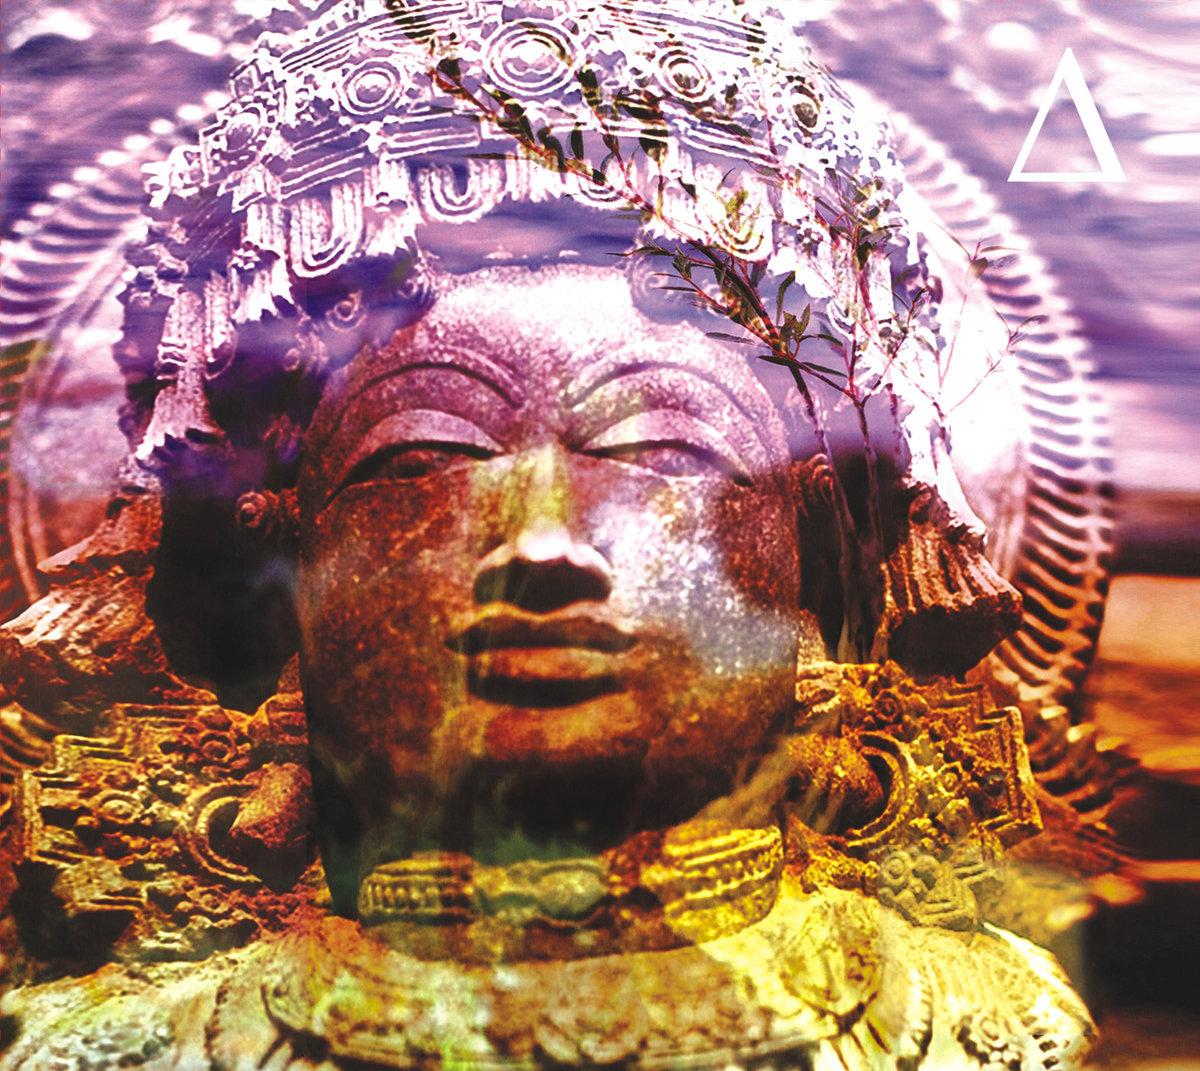 CREATION VI & UHUSHUHU - Δ  CD - 画像1